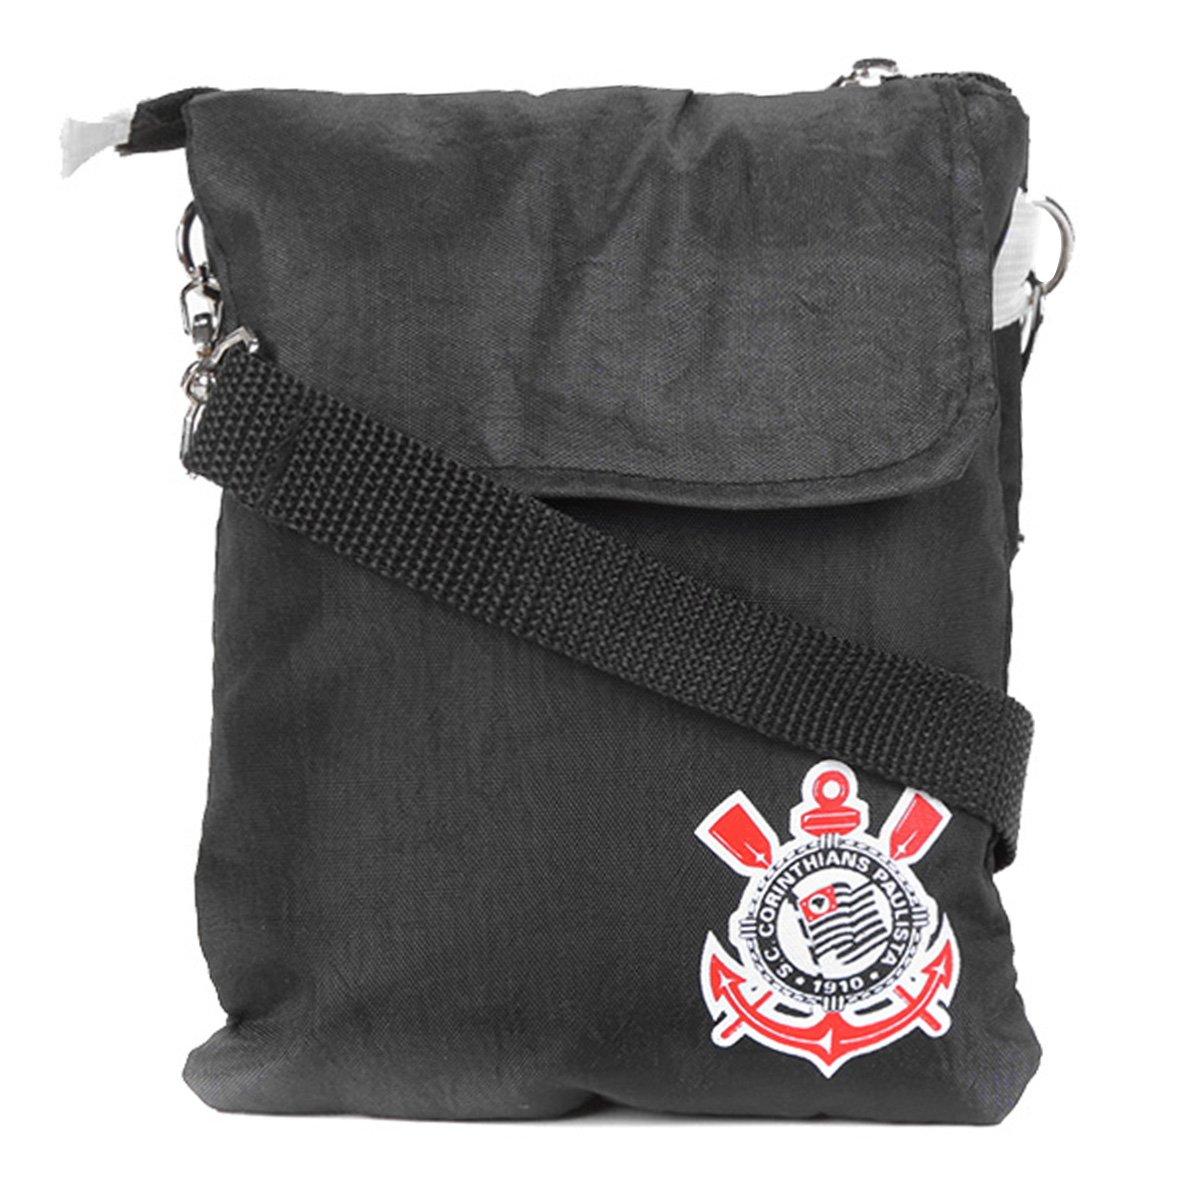 Shoulder Bag Corinthians